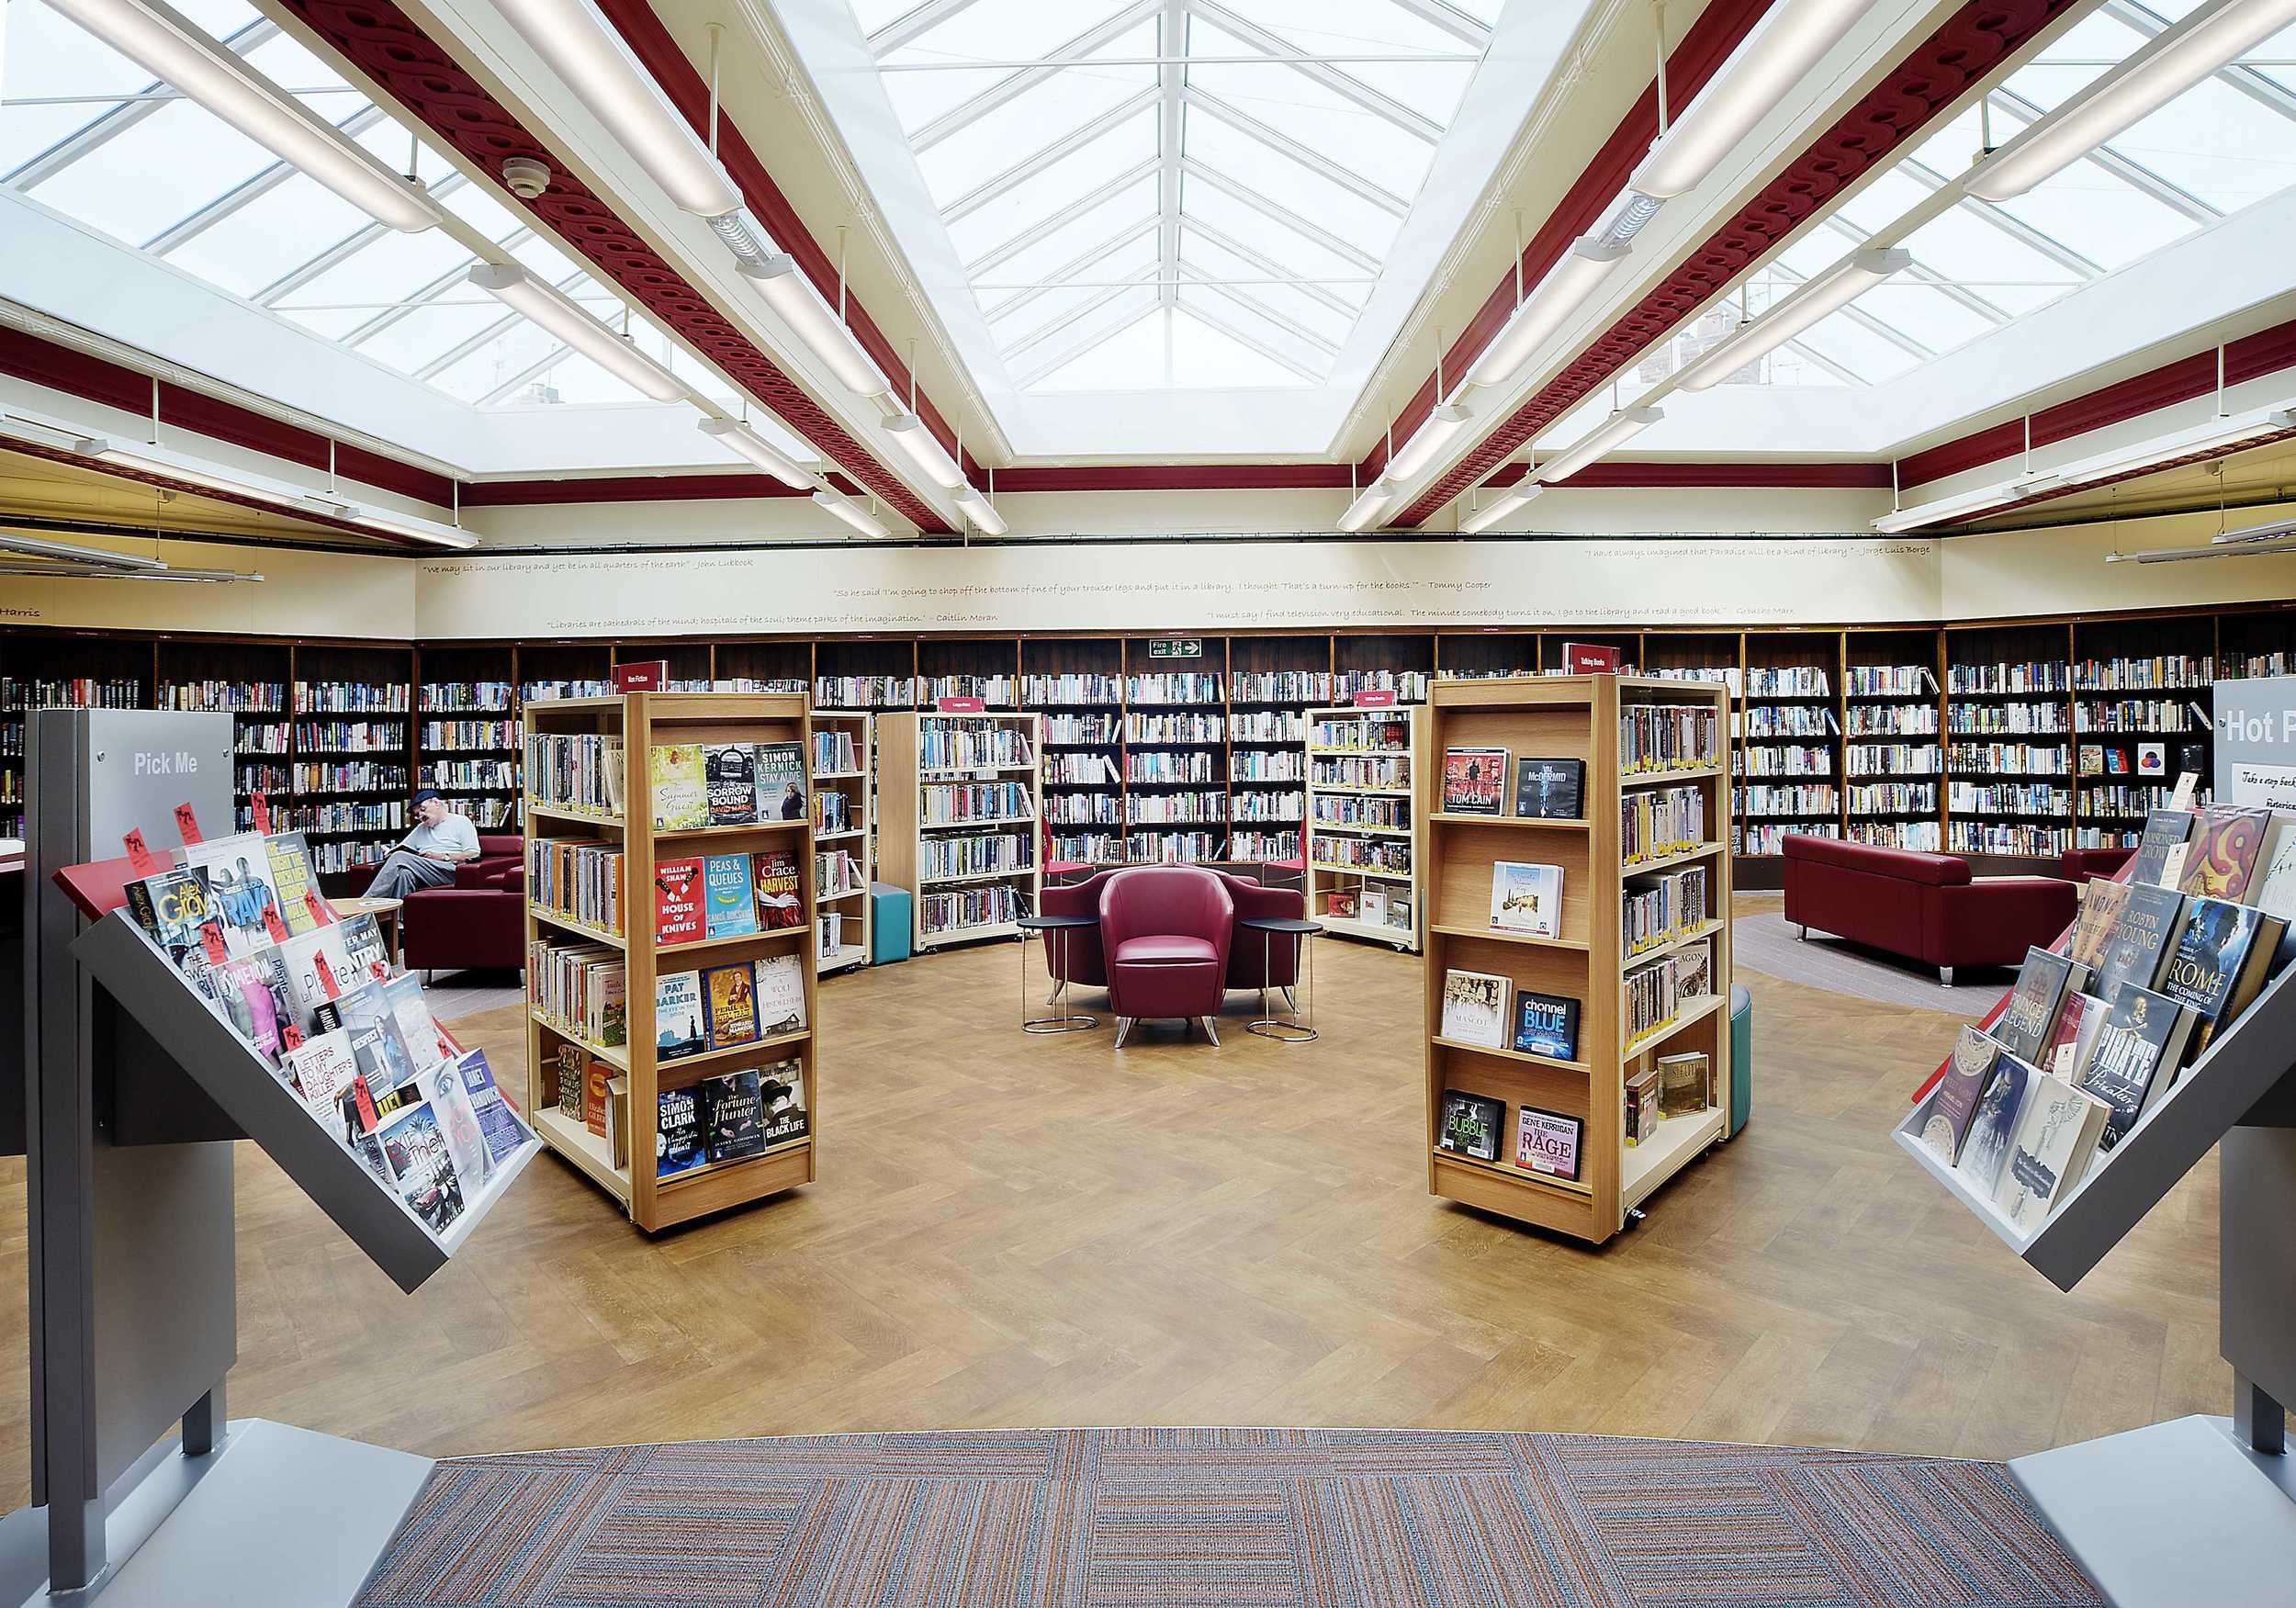 dennisdavis_photography_location_library_interiors.jpg